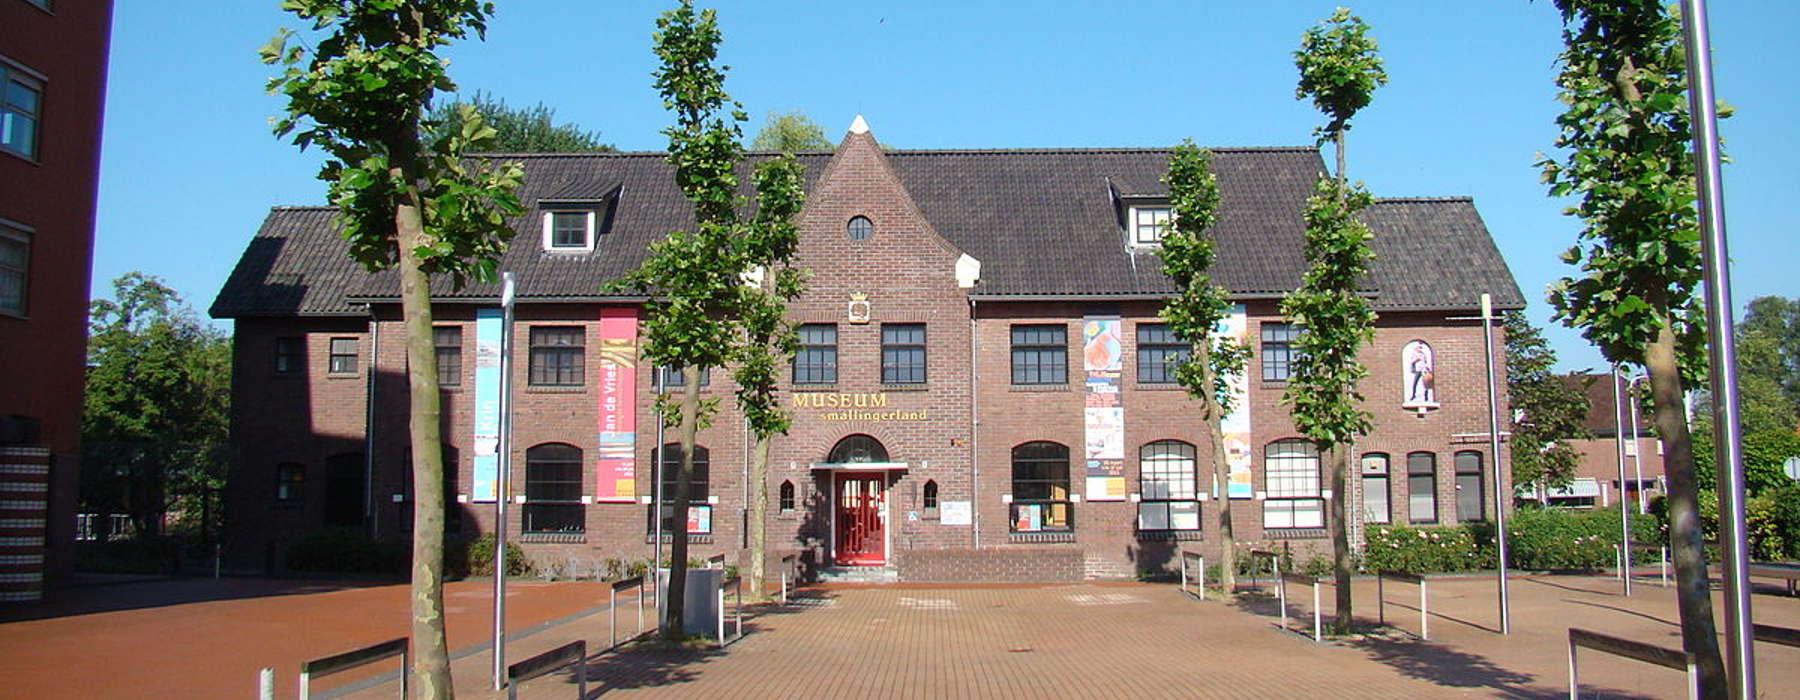 FNP nijs gemeente smellingerlan 2 museum